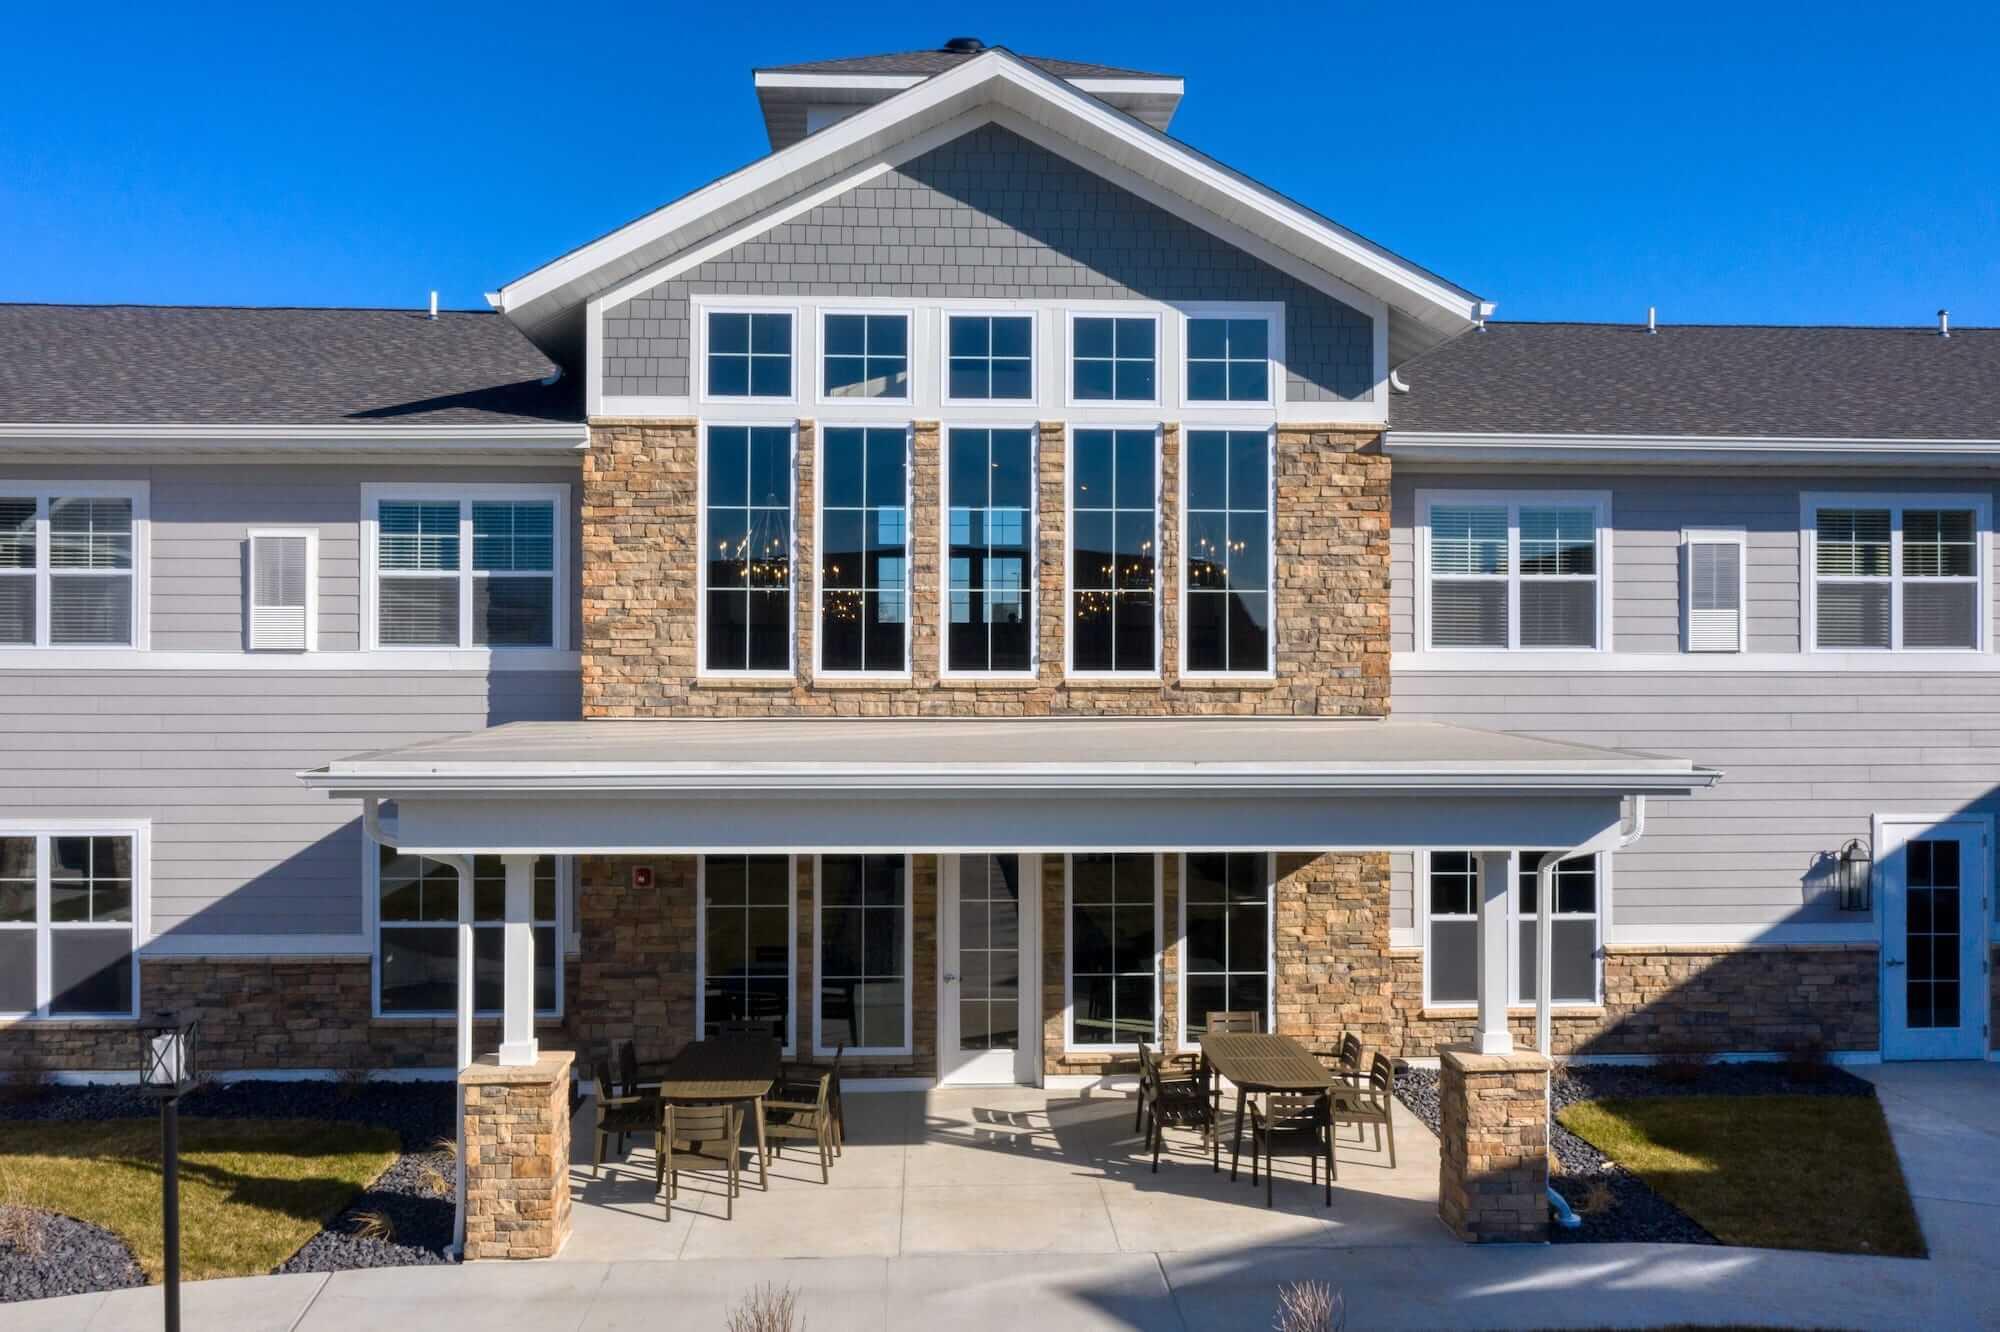 Exterior shot of Cedarhurst Arnold, showing custom masonry and windows